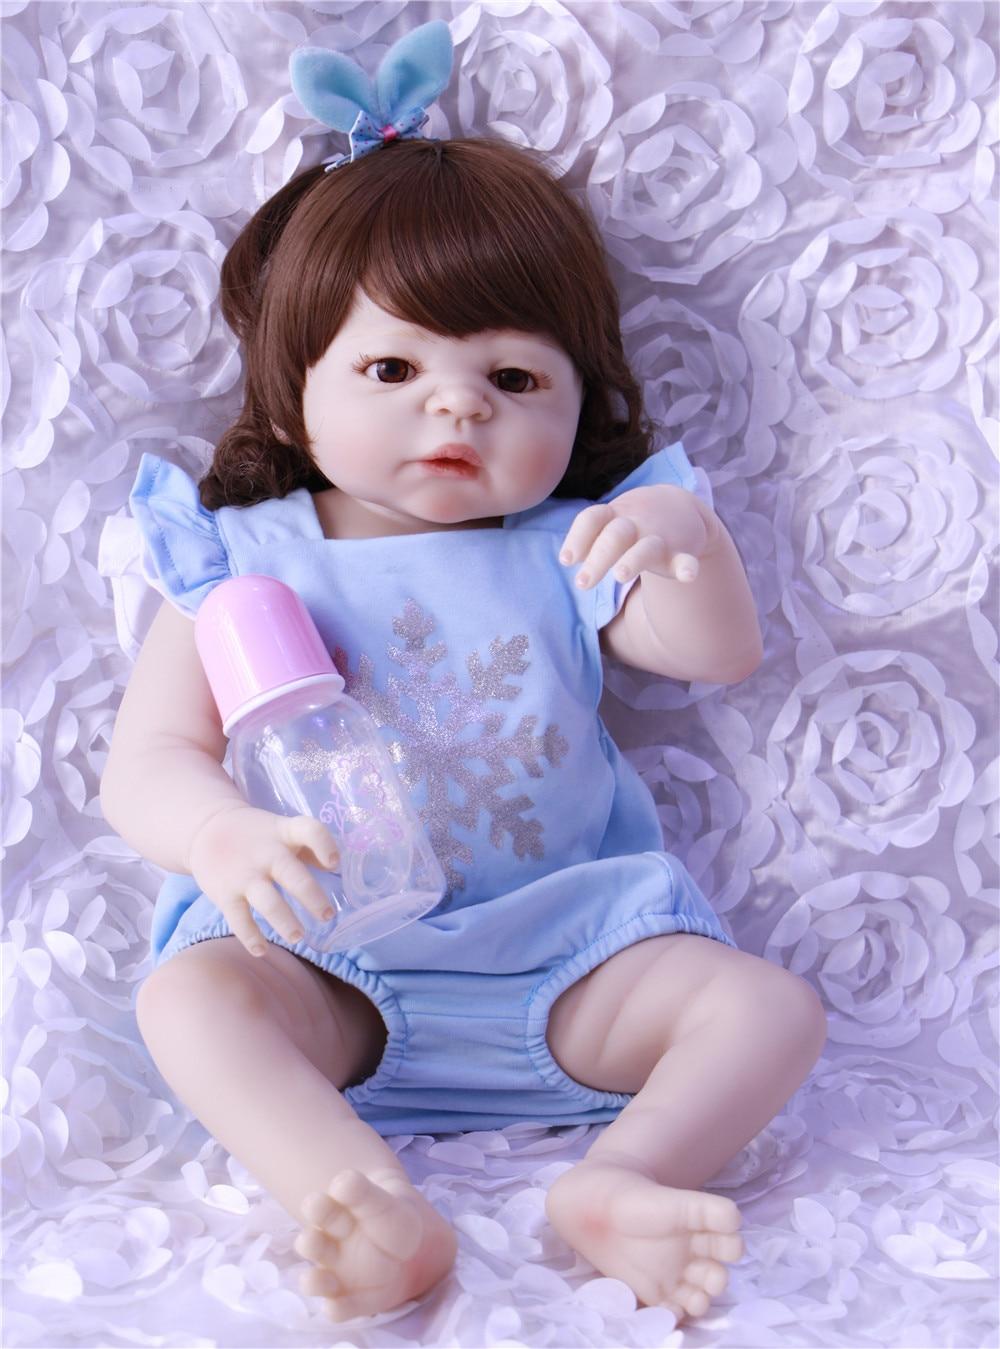 New Design 23 Reborn Baby Dolls Toy Lifelike Full Vinyl Babies Girl Wear  blue clothes Lovely Realistic Boneca Dolls RebornNew Design 23 Reborn Baby Dolls Toy Lifelike Full Vinyl Babies Girl Wear  blue clothes Lovely Realistic Boneca Dolls Reborn